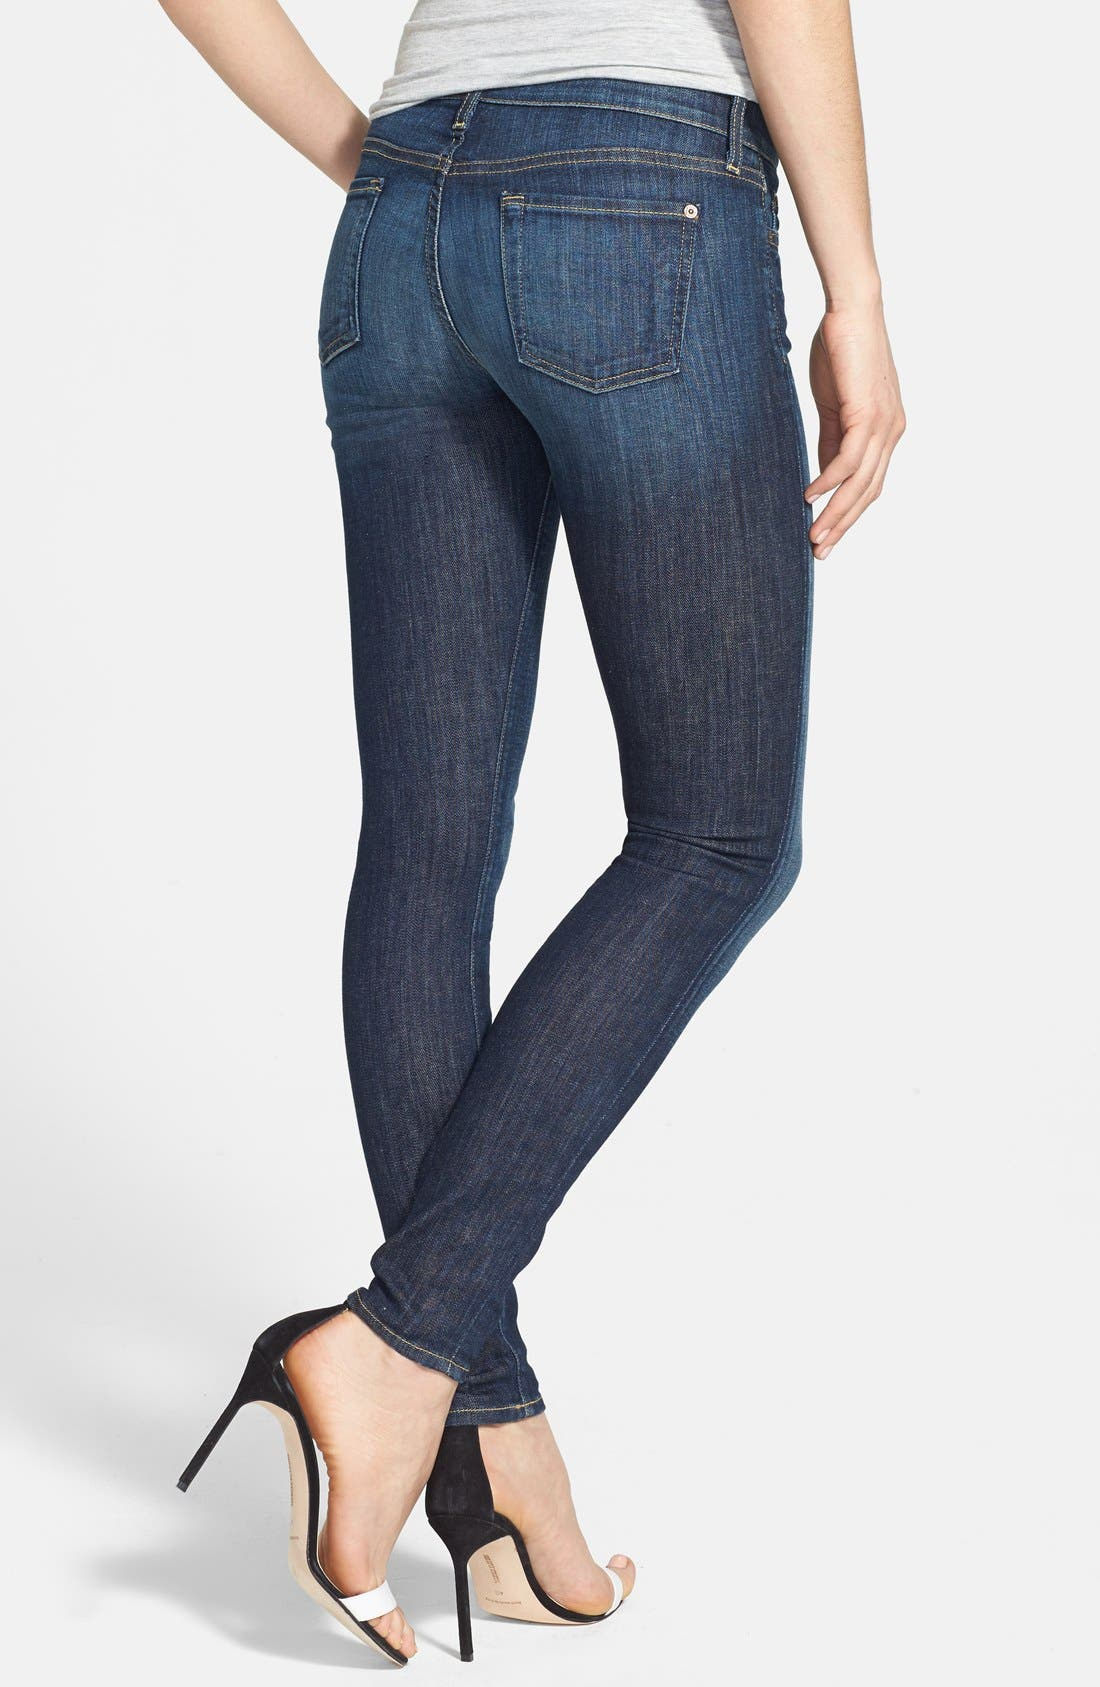 'The Skinny' Mid Rise Skinny Jeans,                             Alternate thumbnail 2, color,                             400